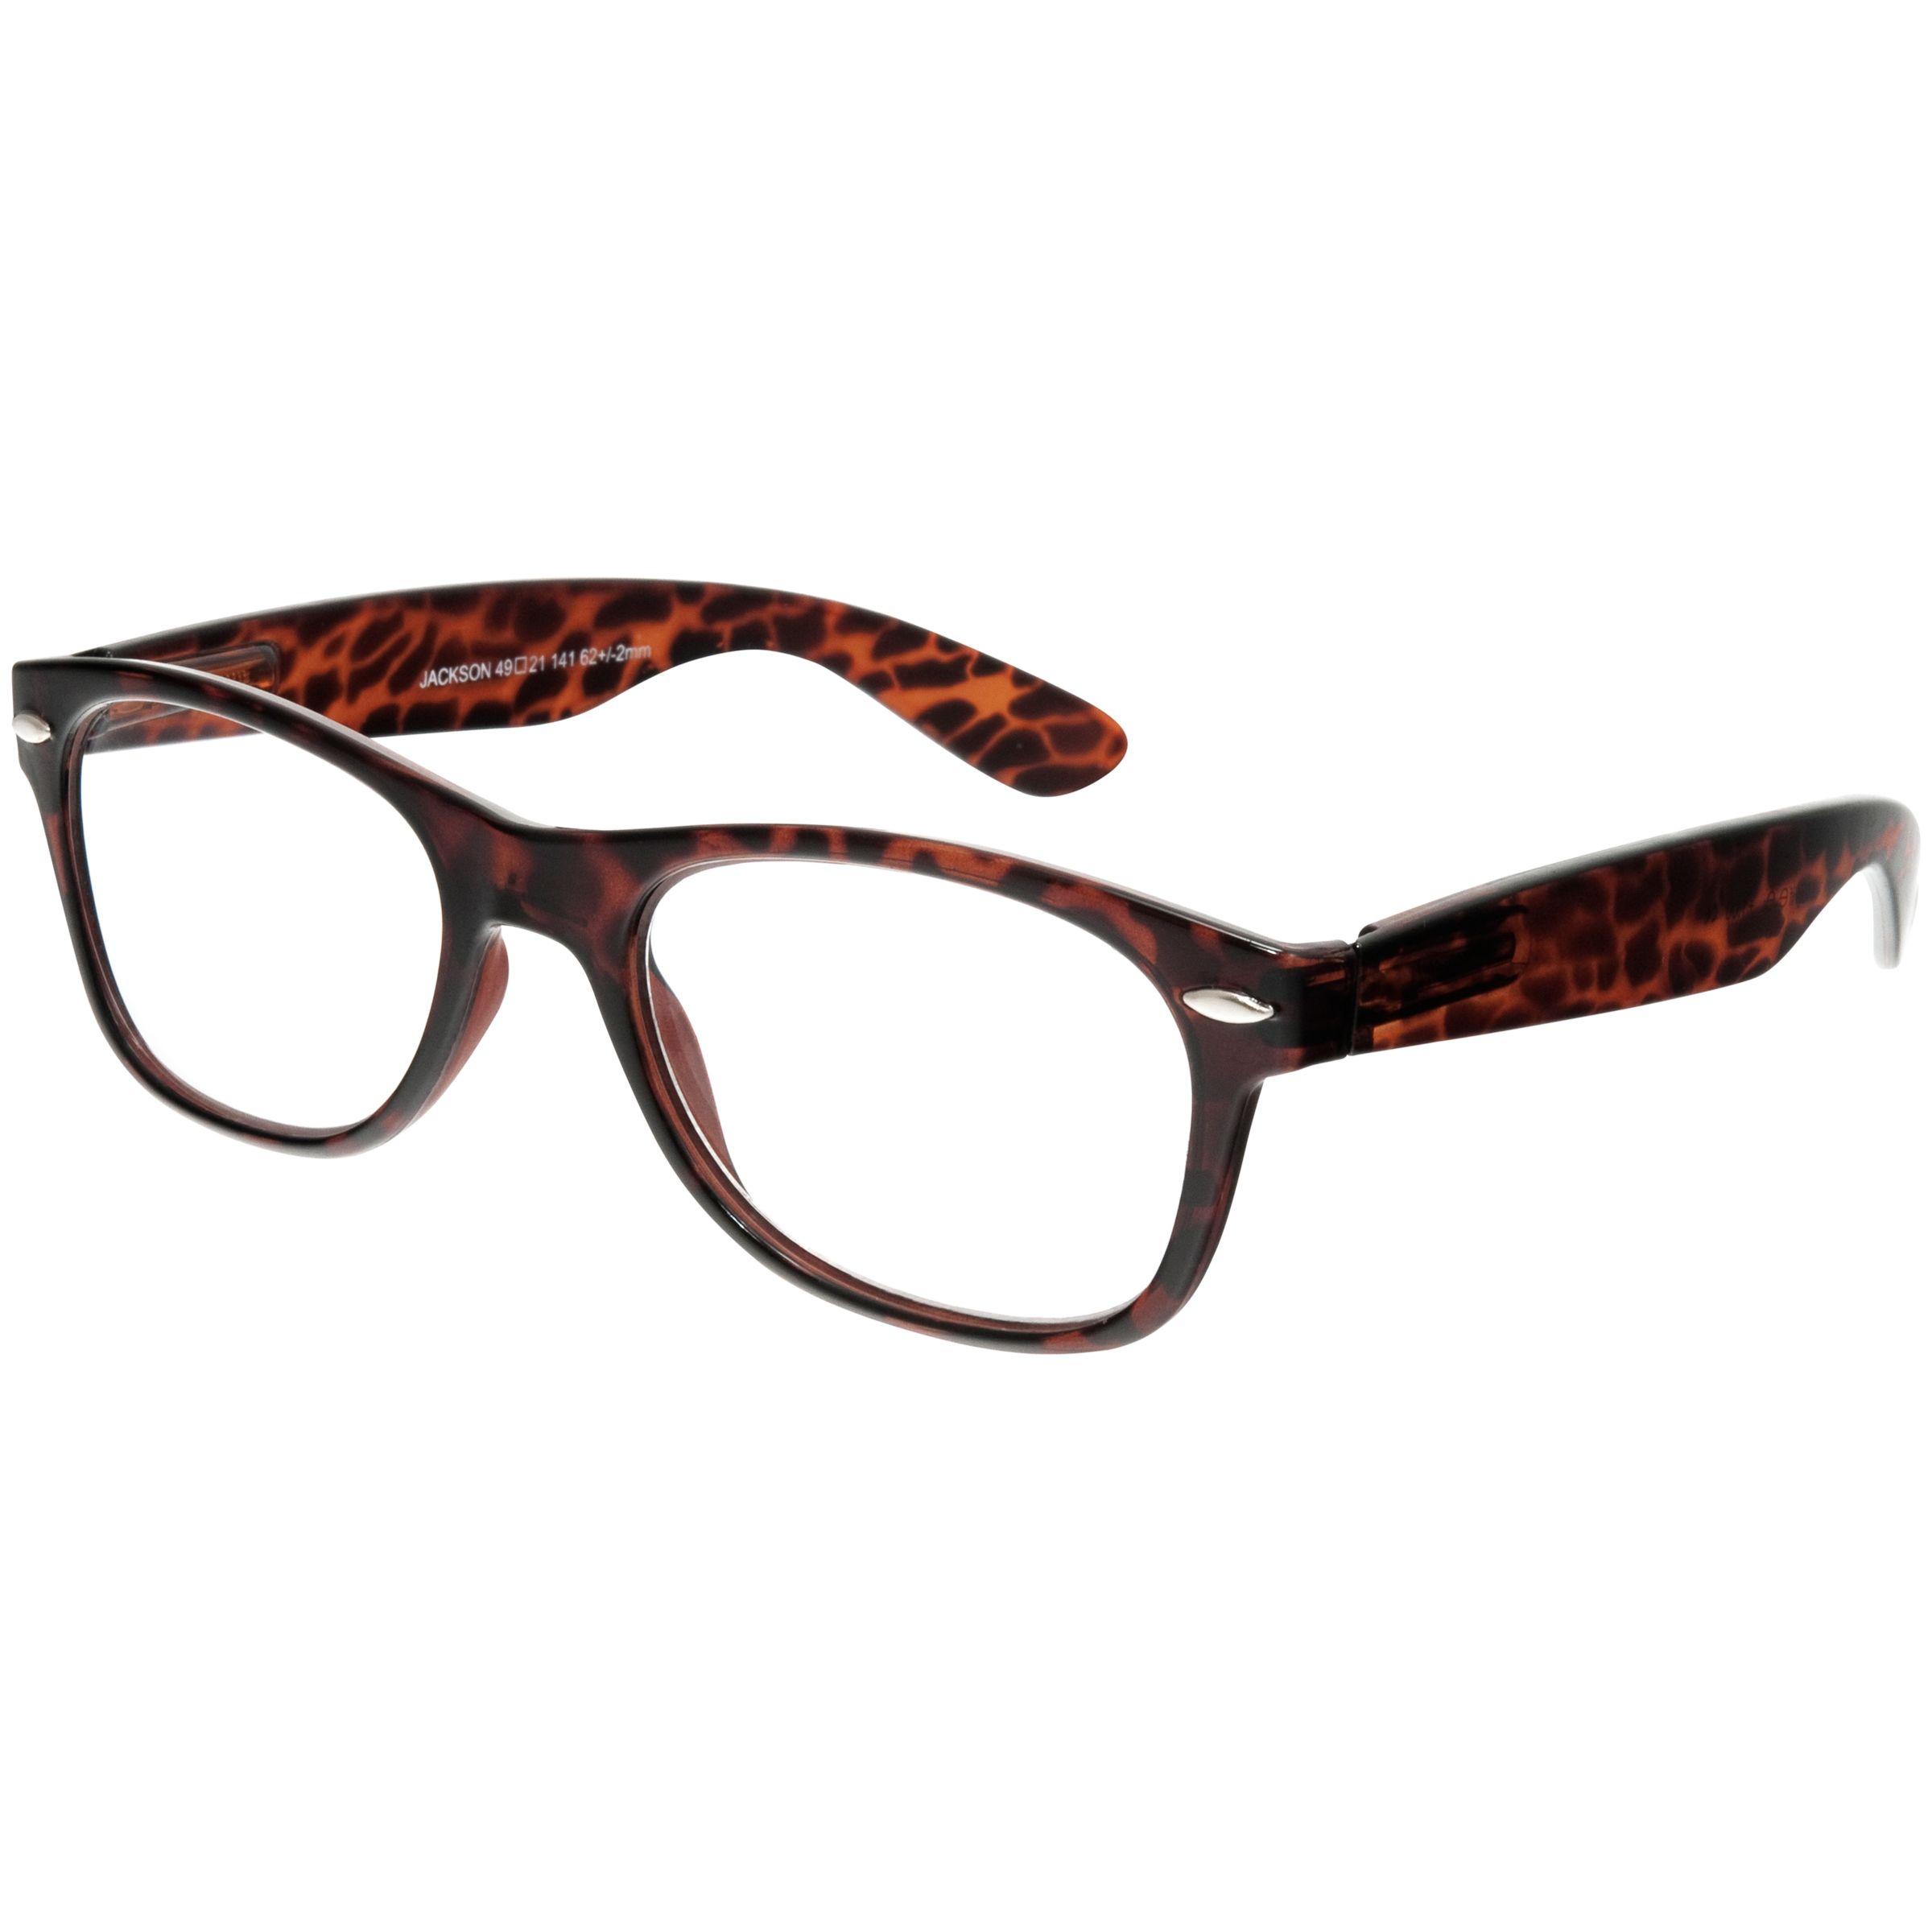 Magnif Eyes Magnif Eyes Ready Readers Jackson Glasses, Tortoise